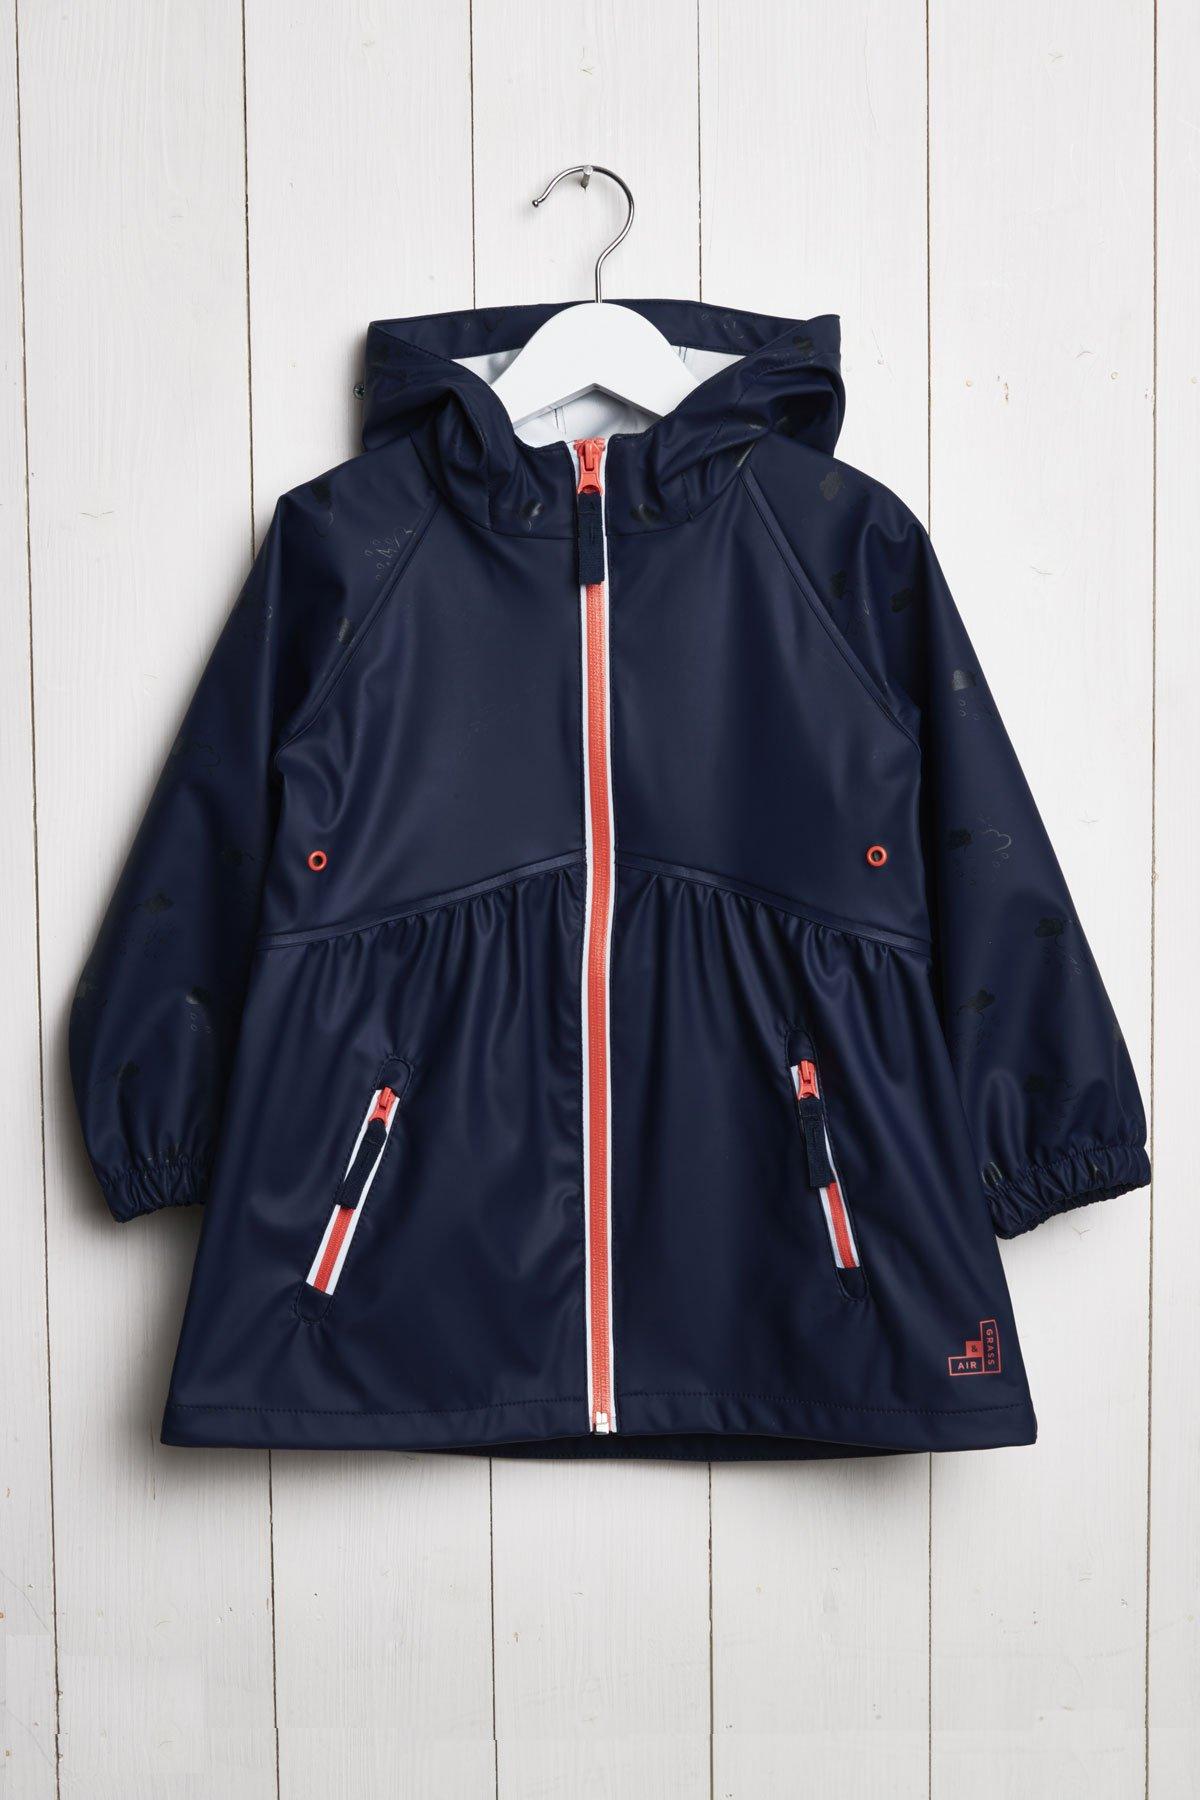 girls raincloud navy reflective rain coat product hanger shot (front view)